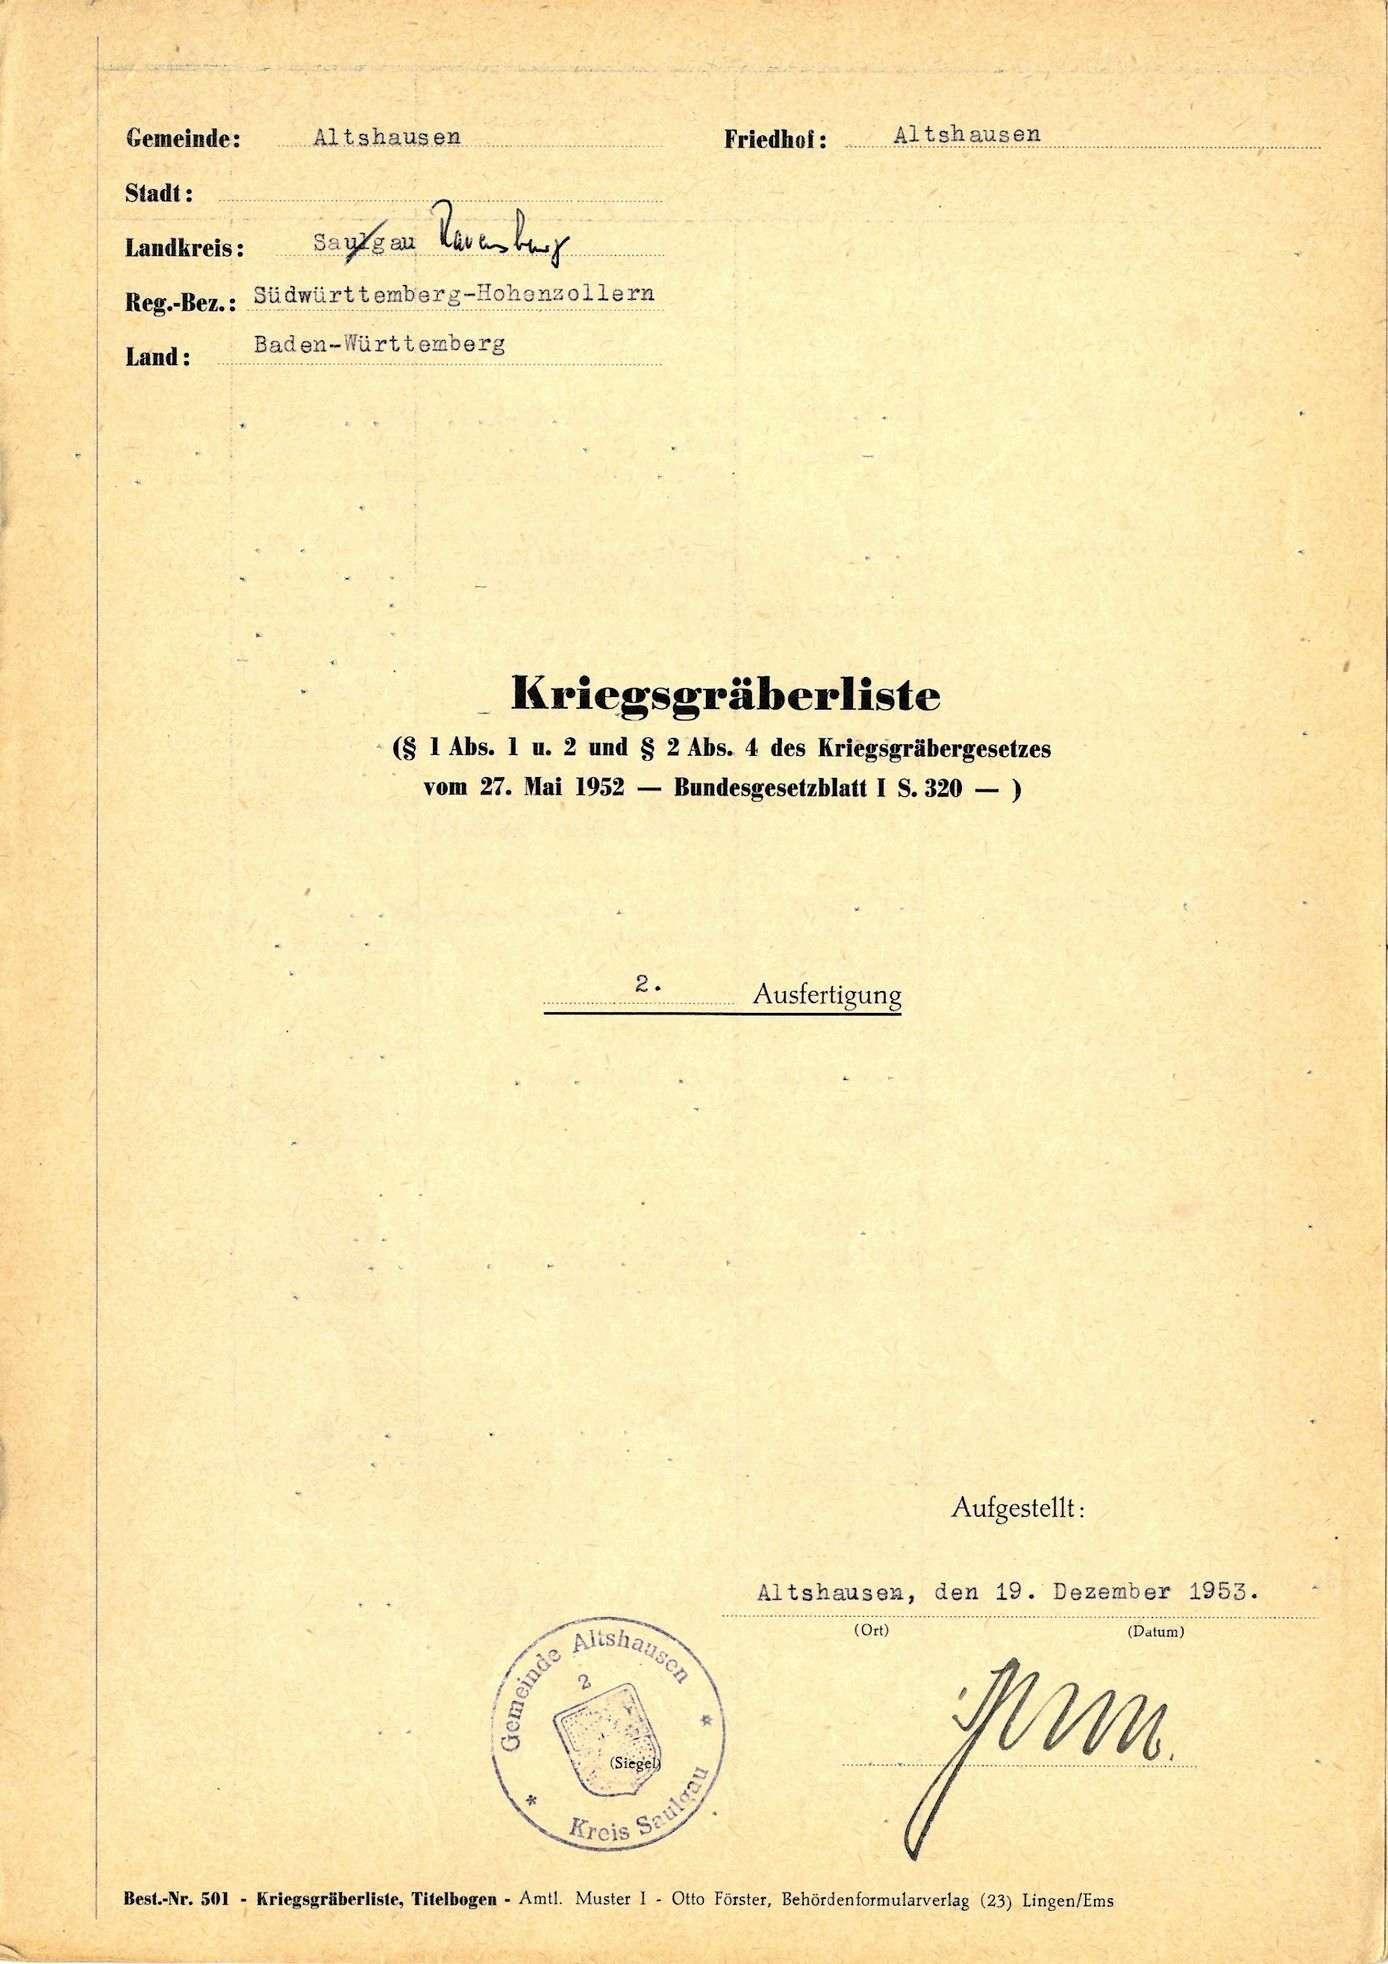 Altshausen, Bild 1